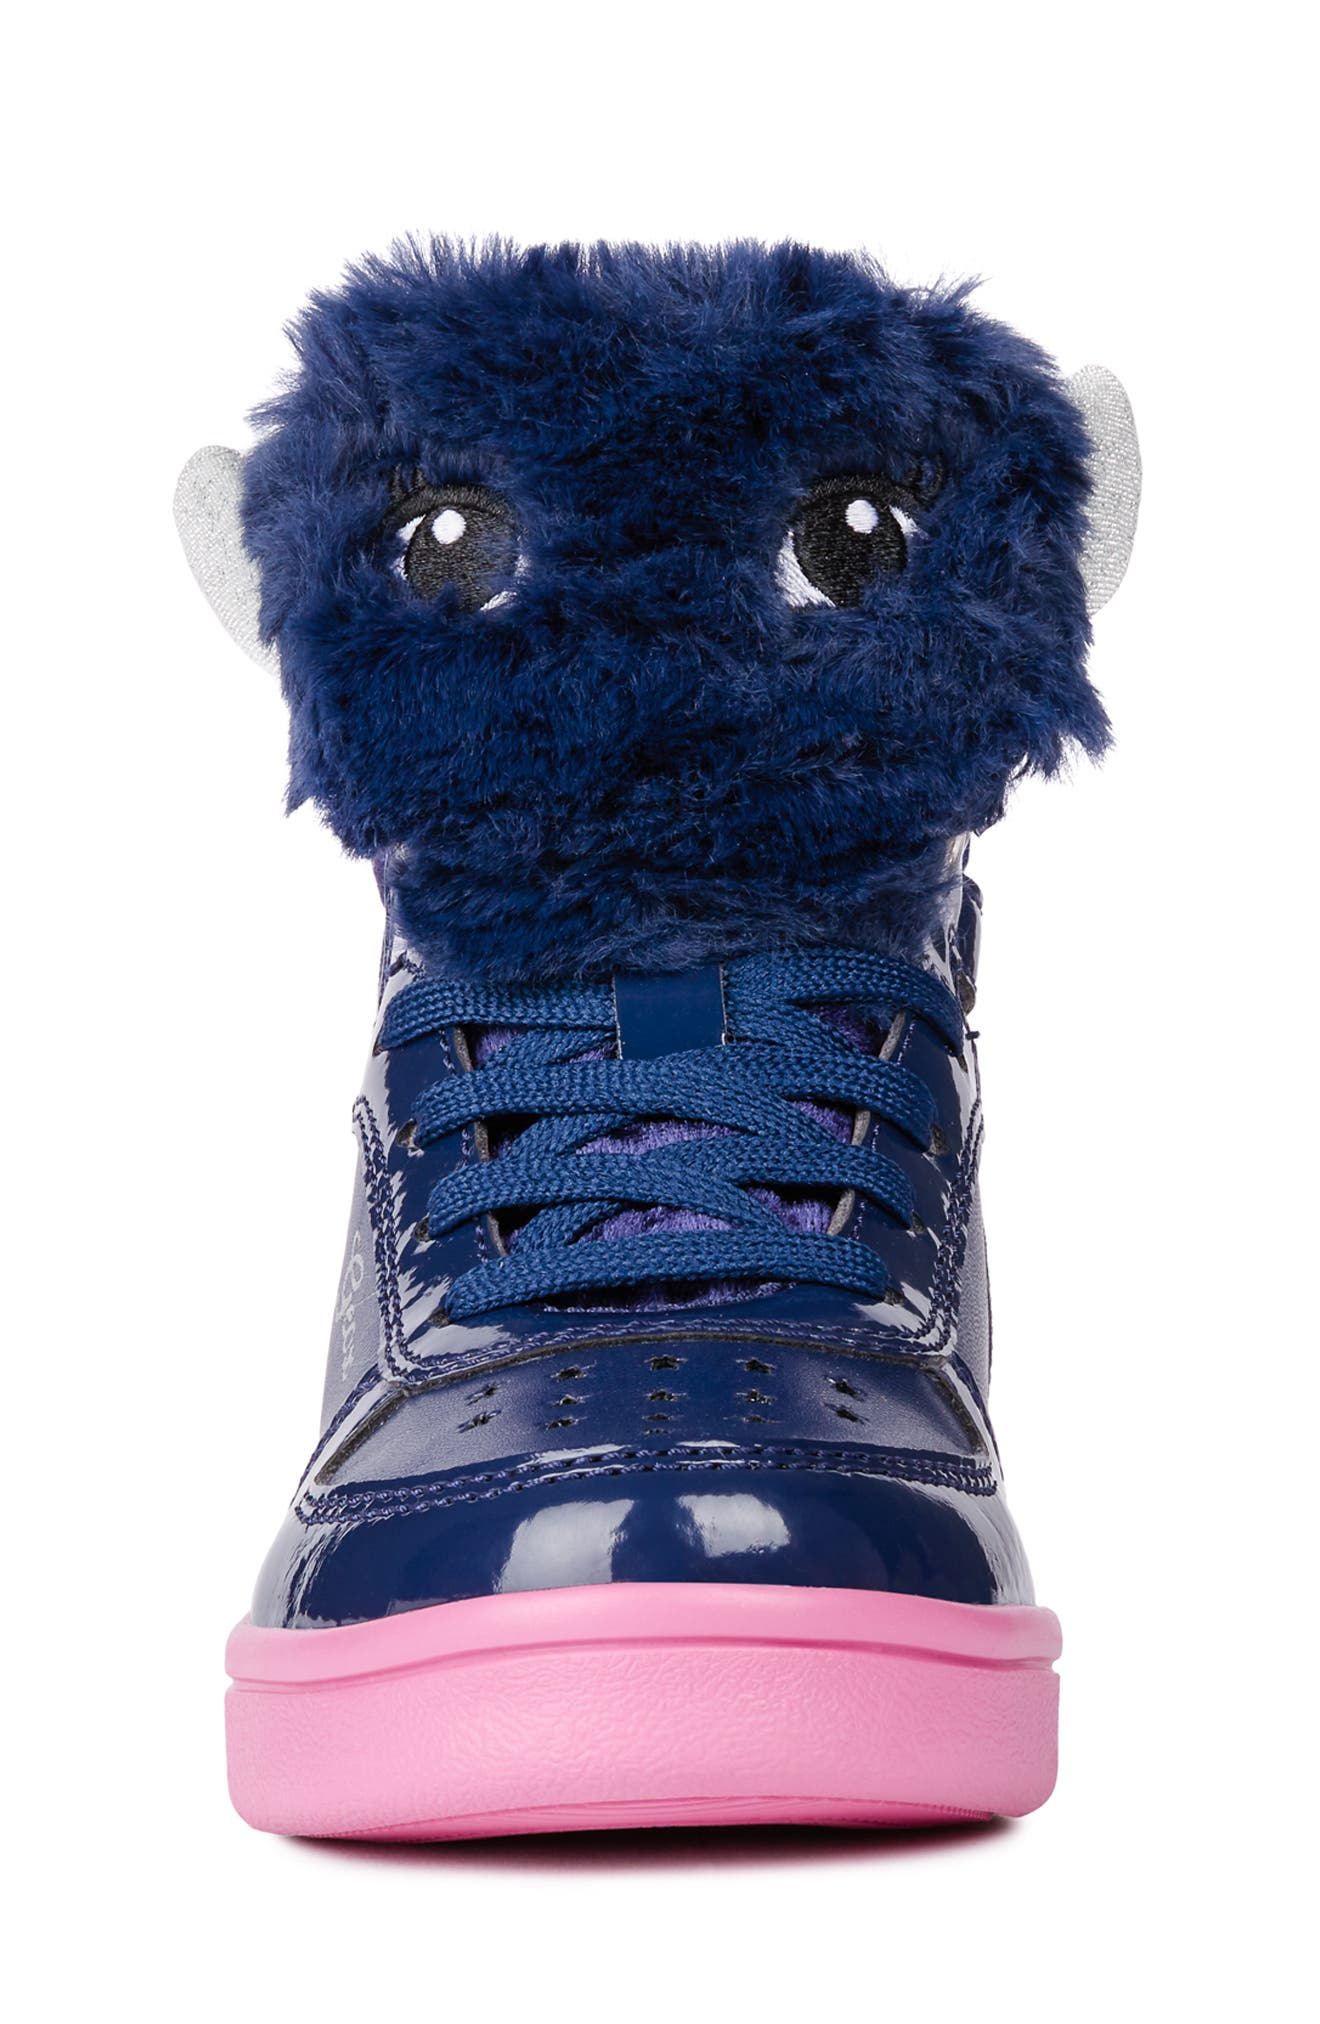 DJ Rock Fuzzy Friend Sneaker,                             Alternate thumbnail 4, color,                             NAVY/FUCHSIA